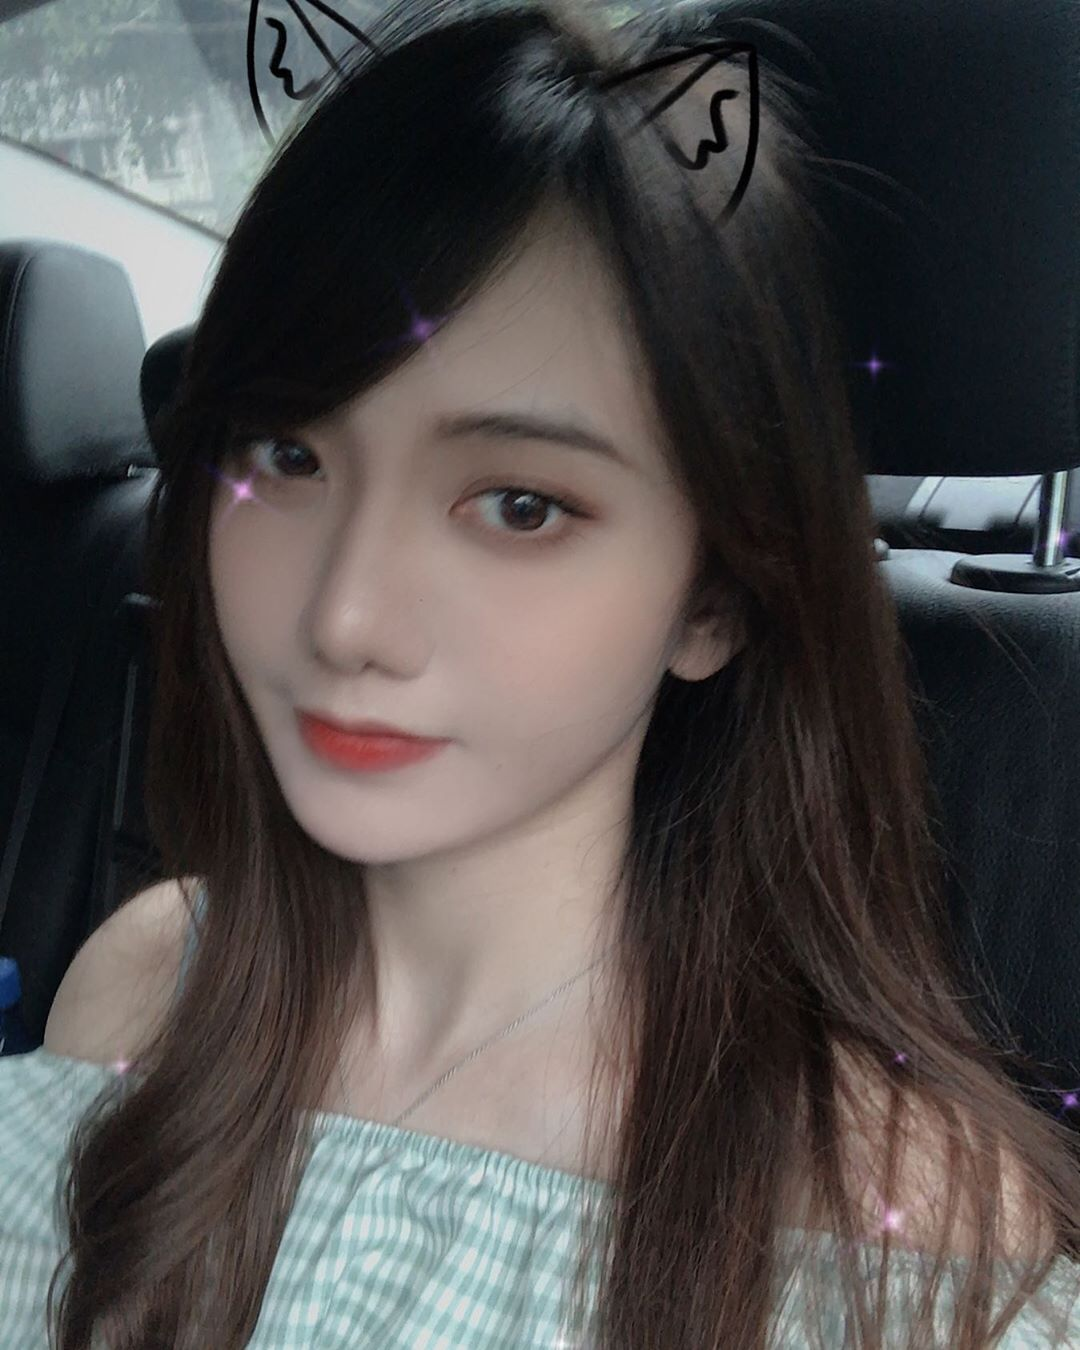 141241bdd4yeonz9dbbiy9